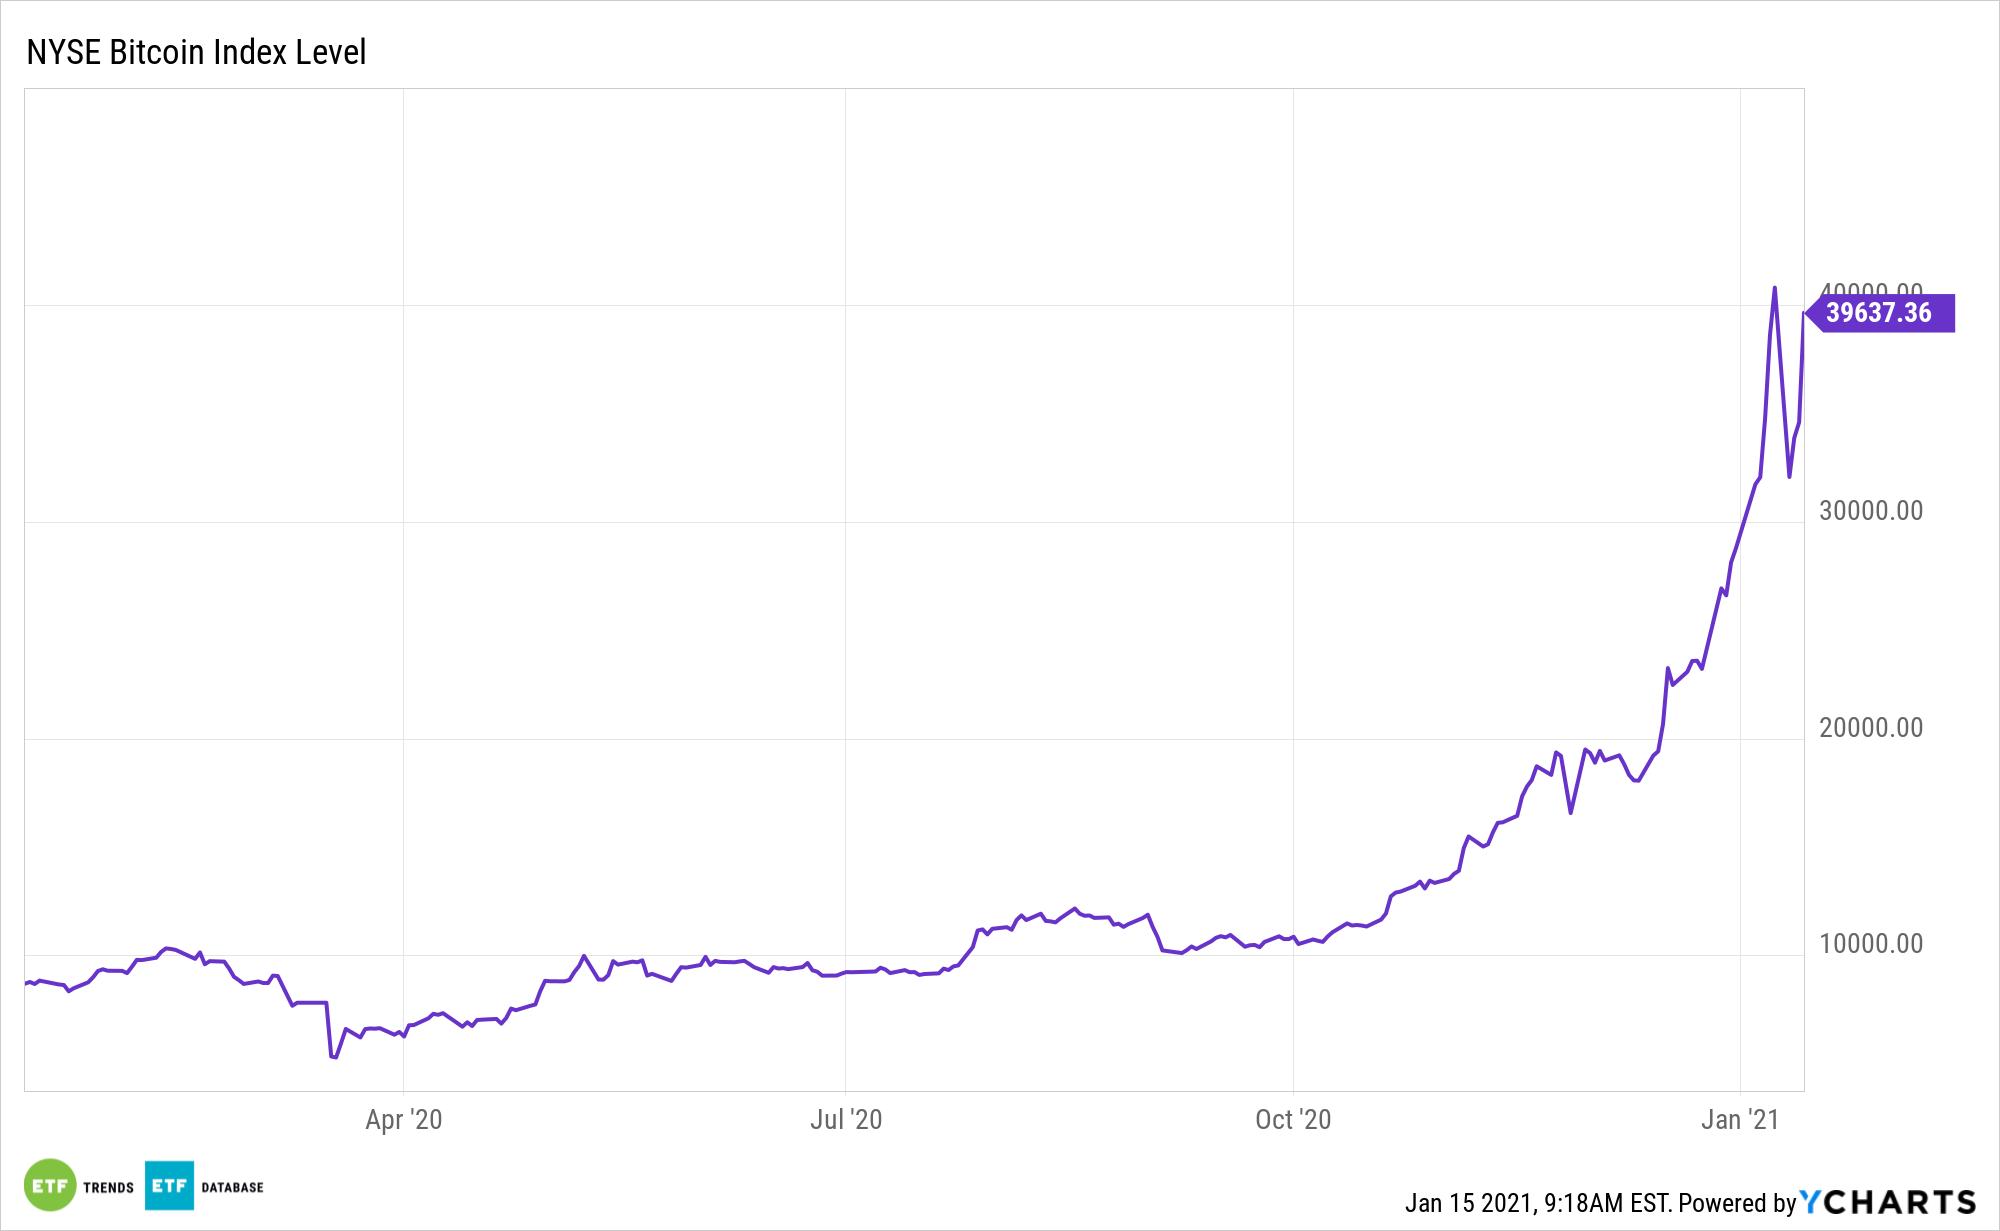 NYSE Bitcoin Index 1 Year